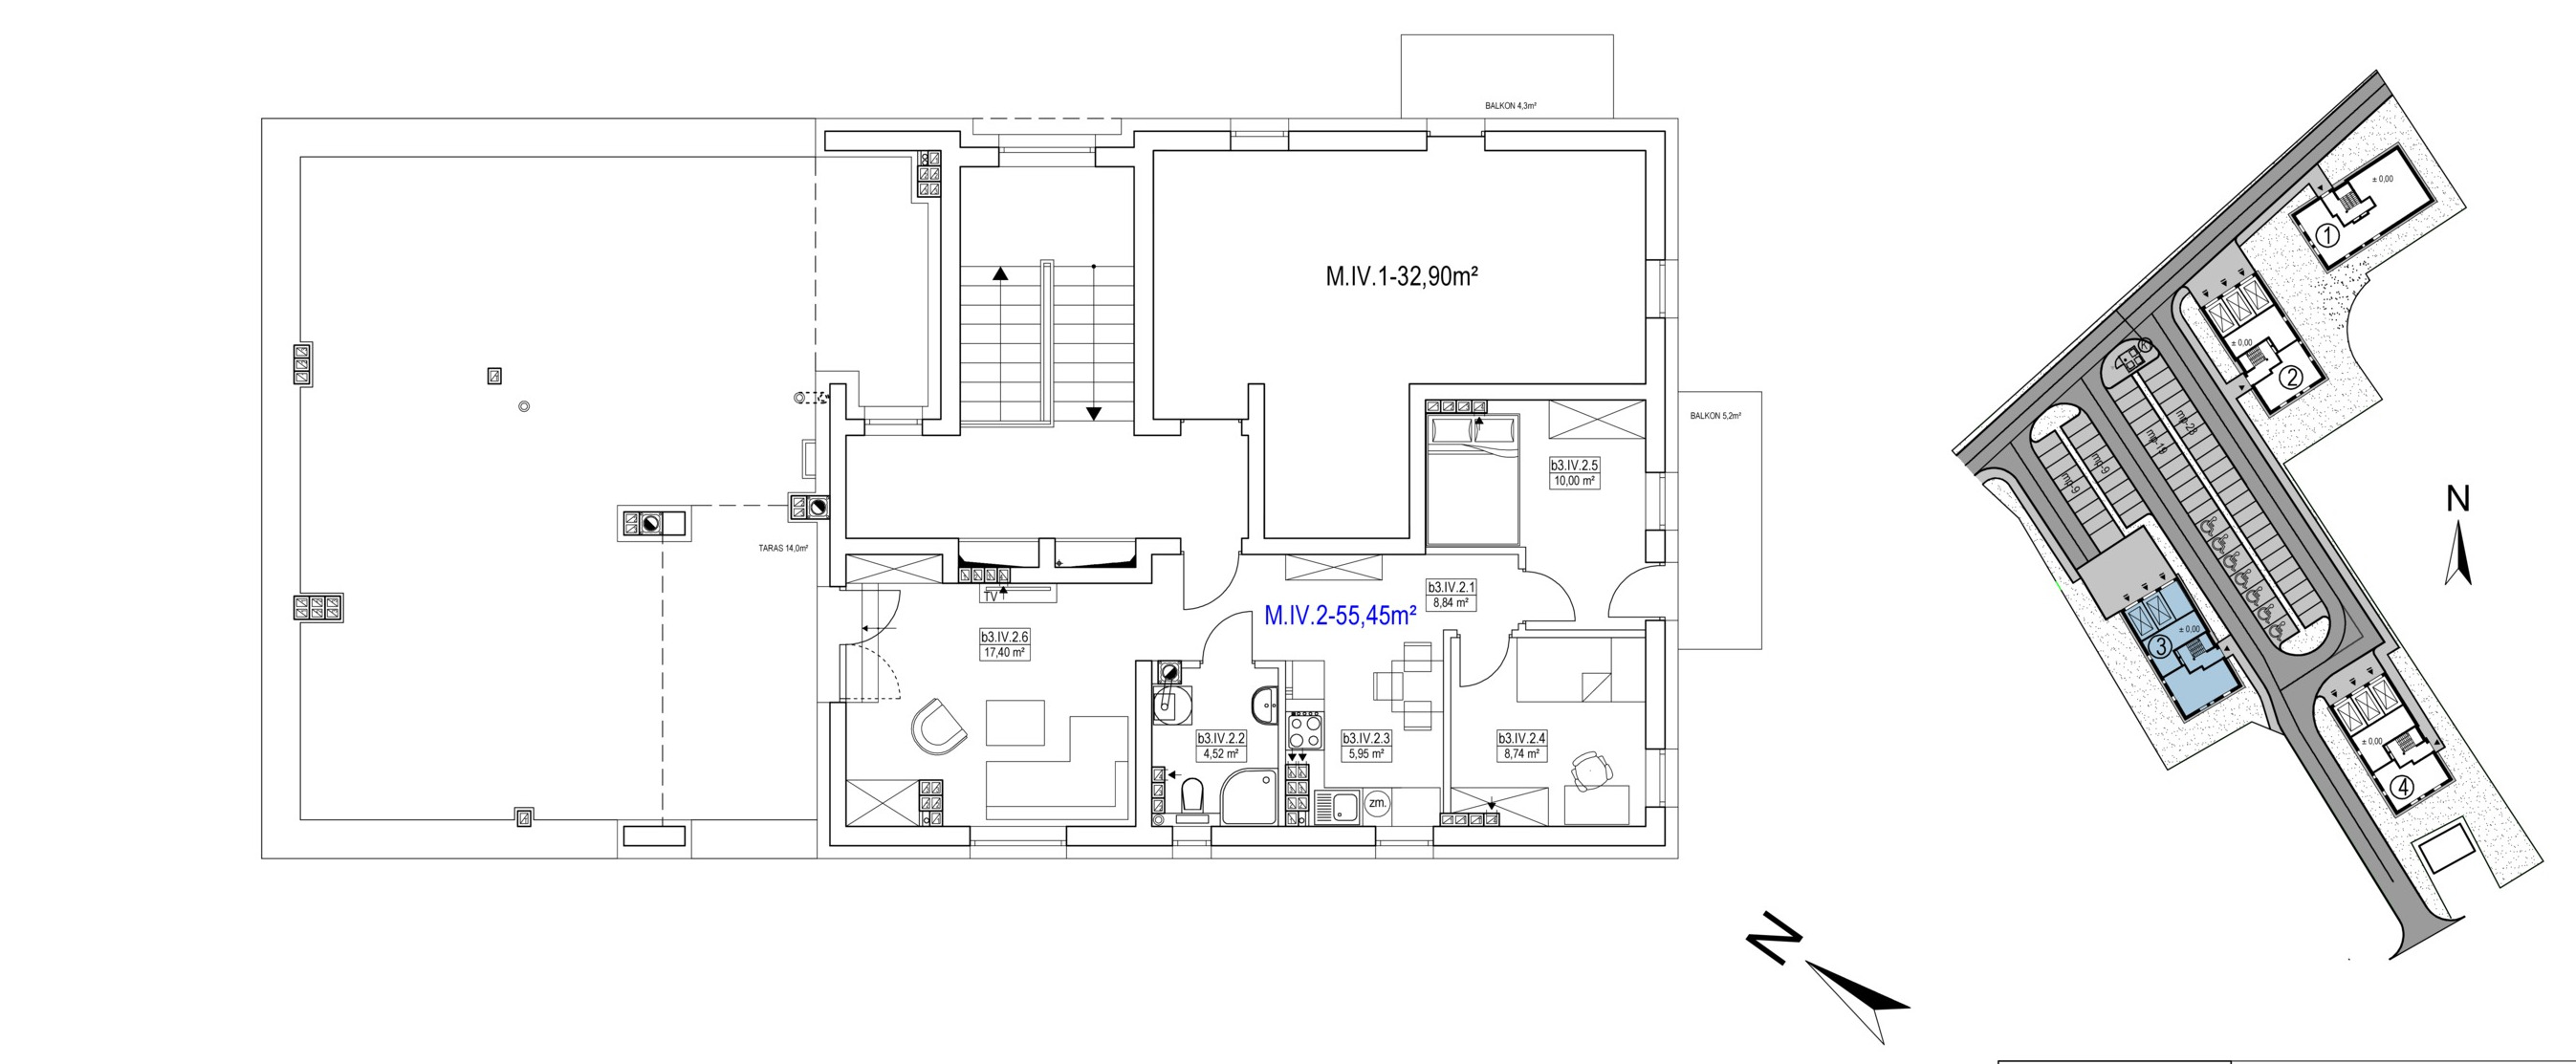 /assets/img/flats/B3.M.IV.2.jpg